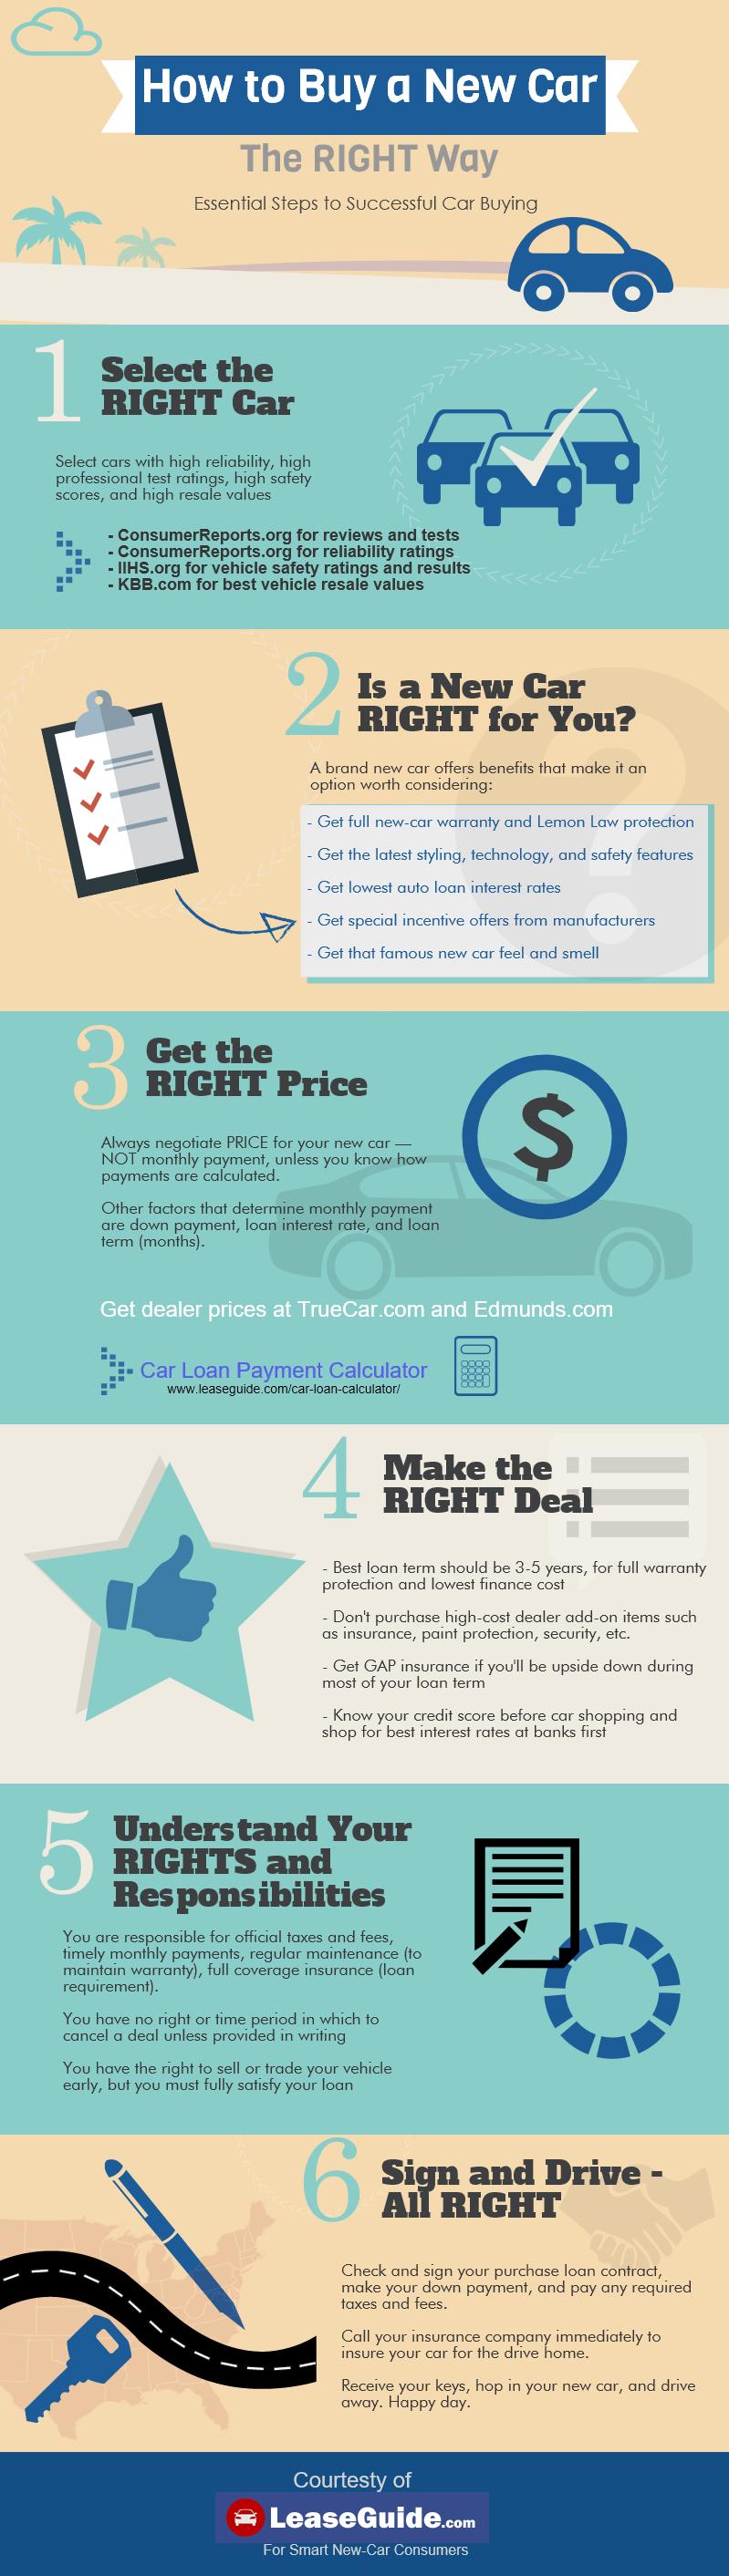 lease or buy calculator